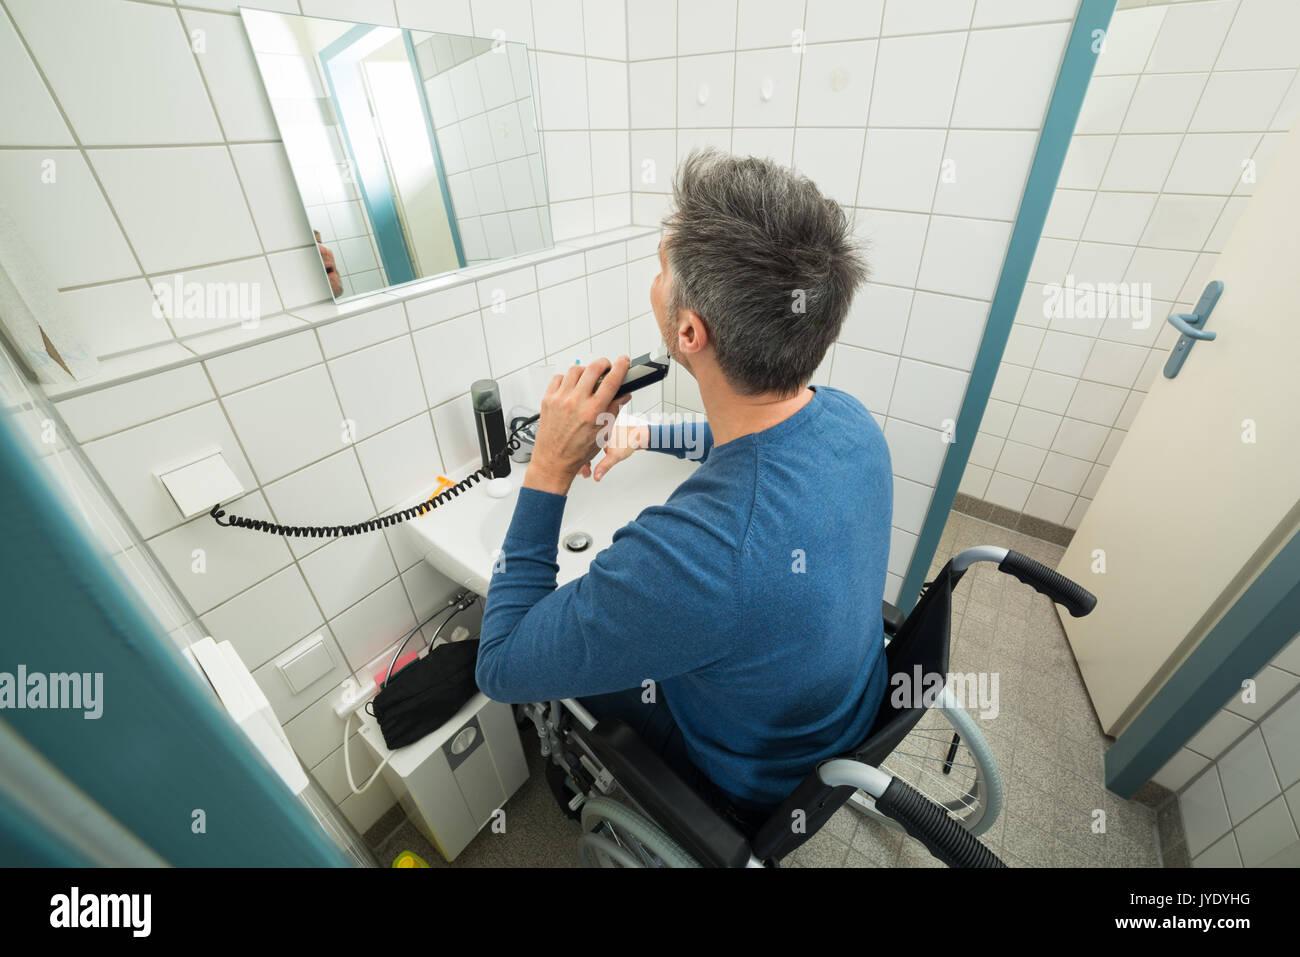 Handicap Bathroom Stock Photos Handicap Bathroom Stock Images Alamy